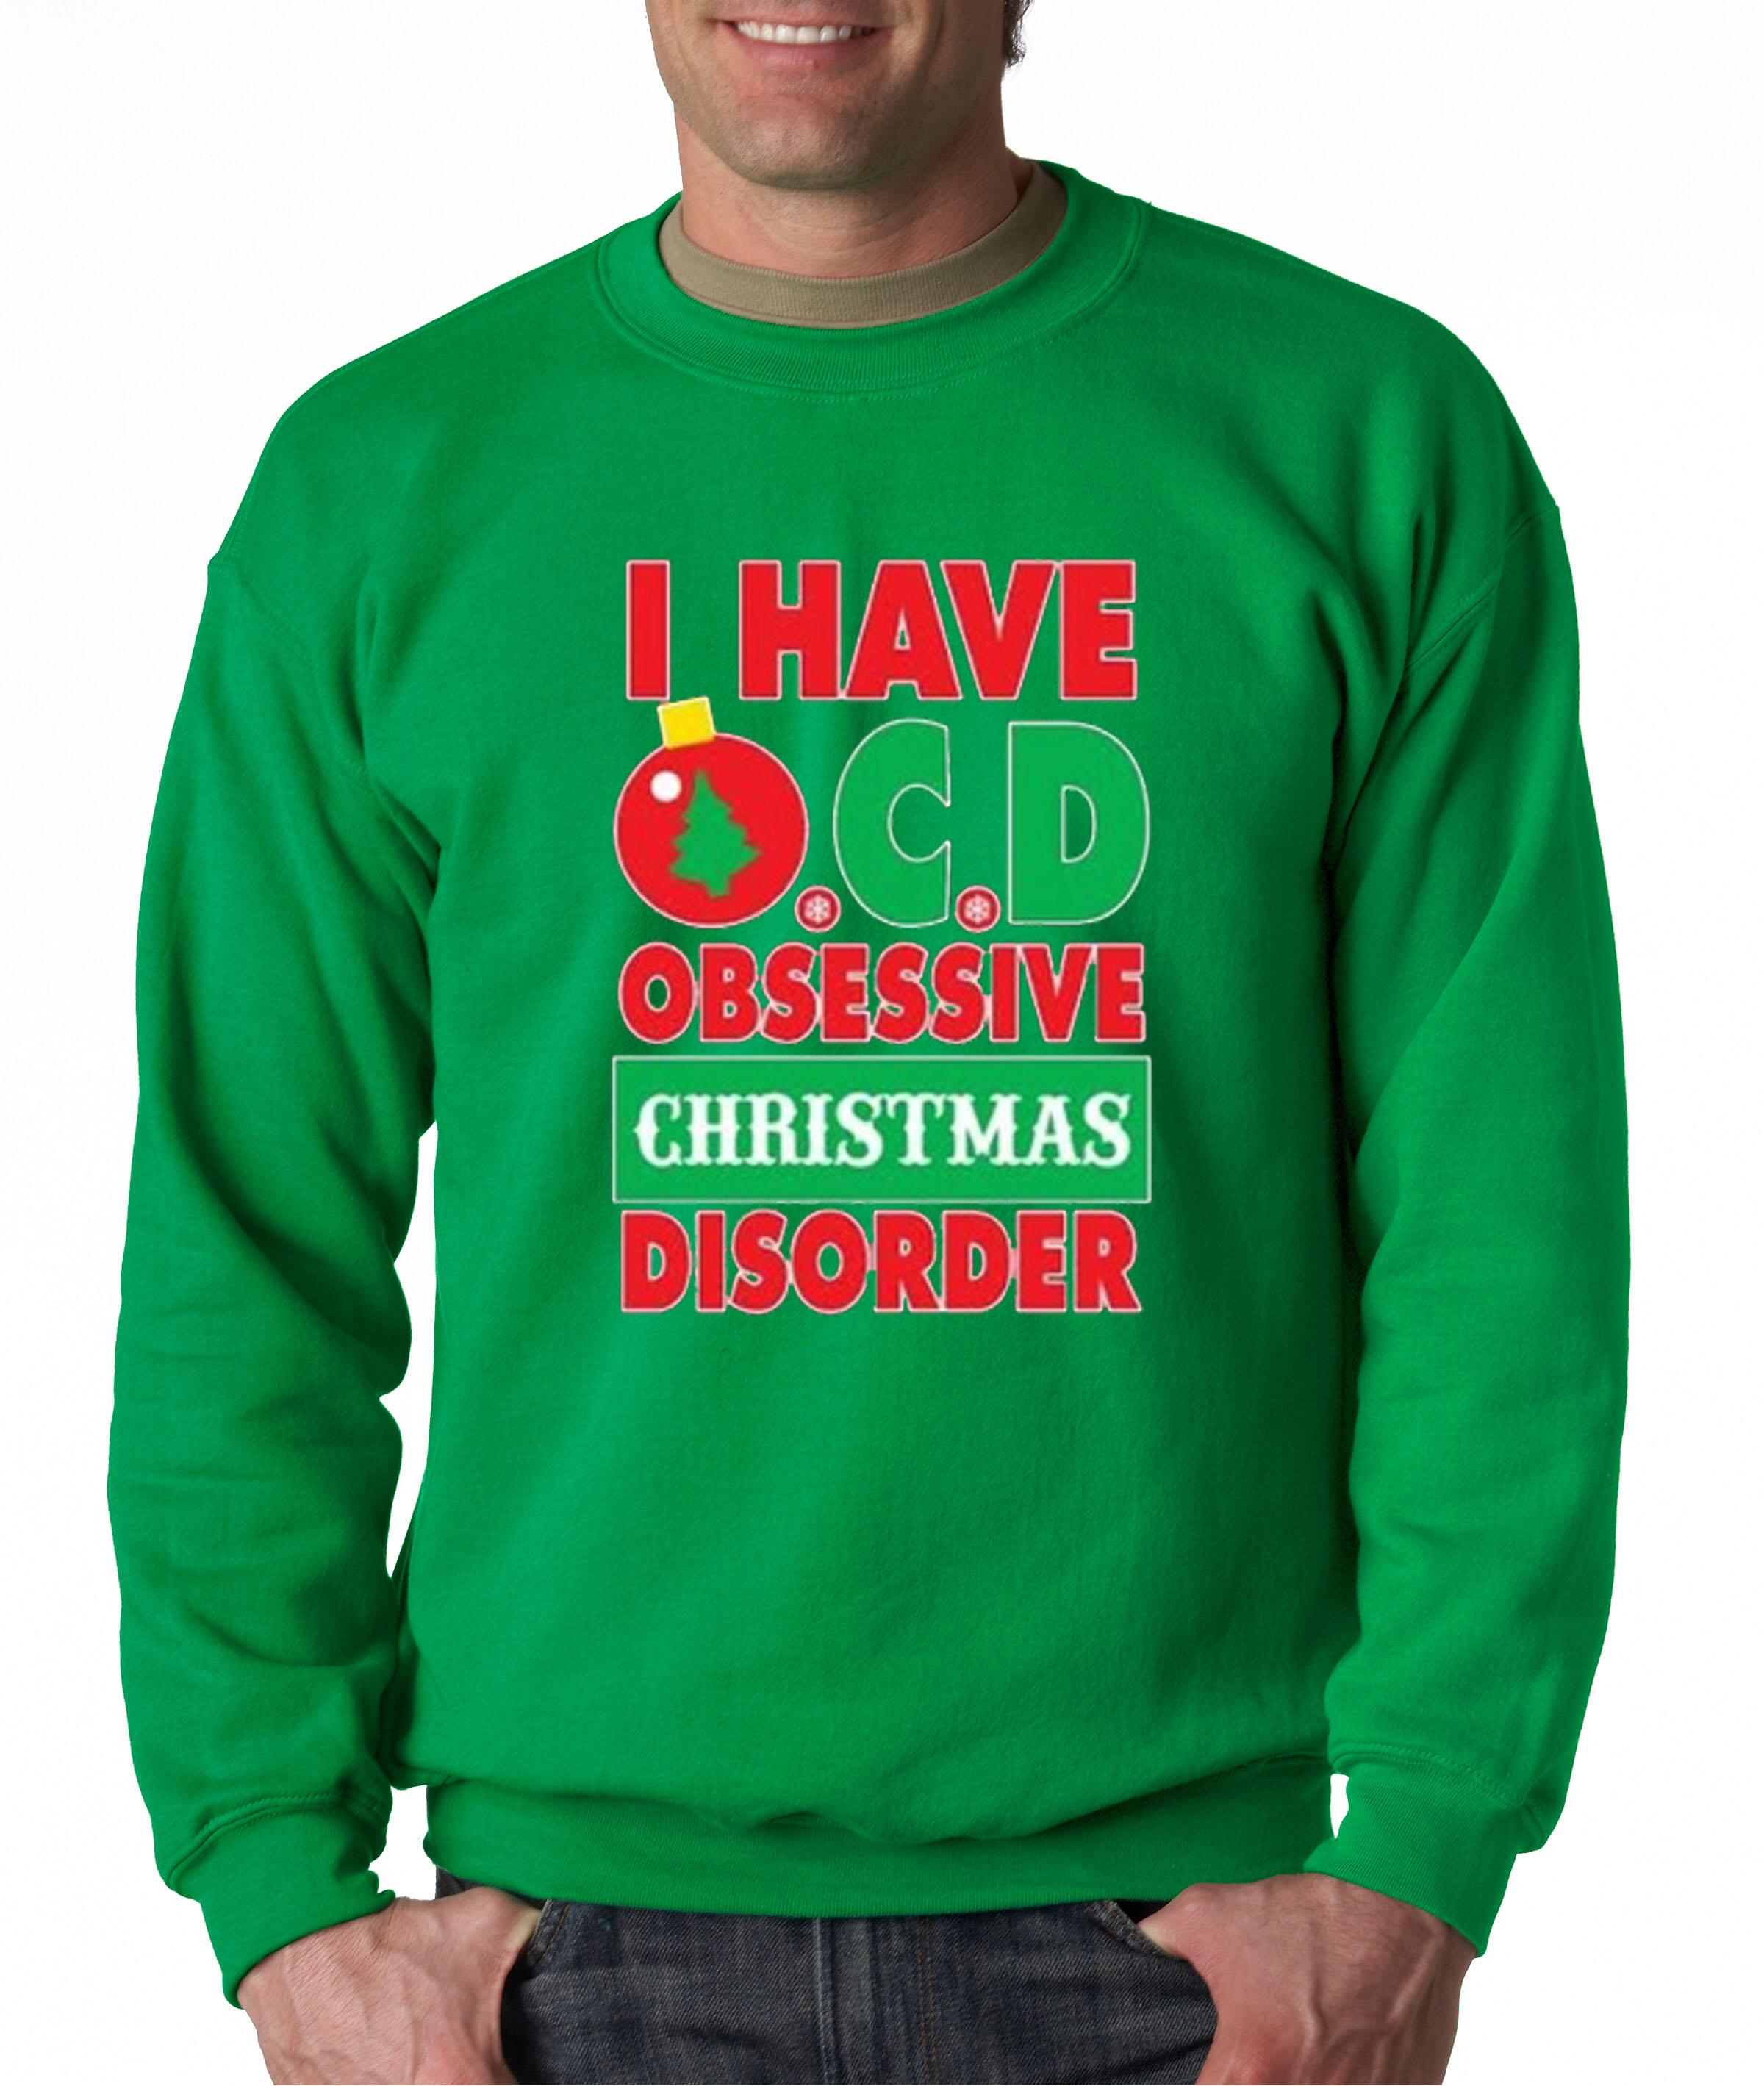 New Way 179 - Crewneck I Have Ocd Obsessive Christmas Disorder ...